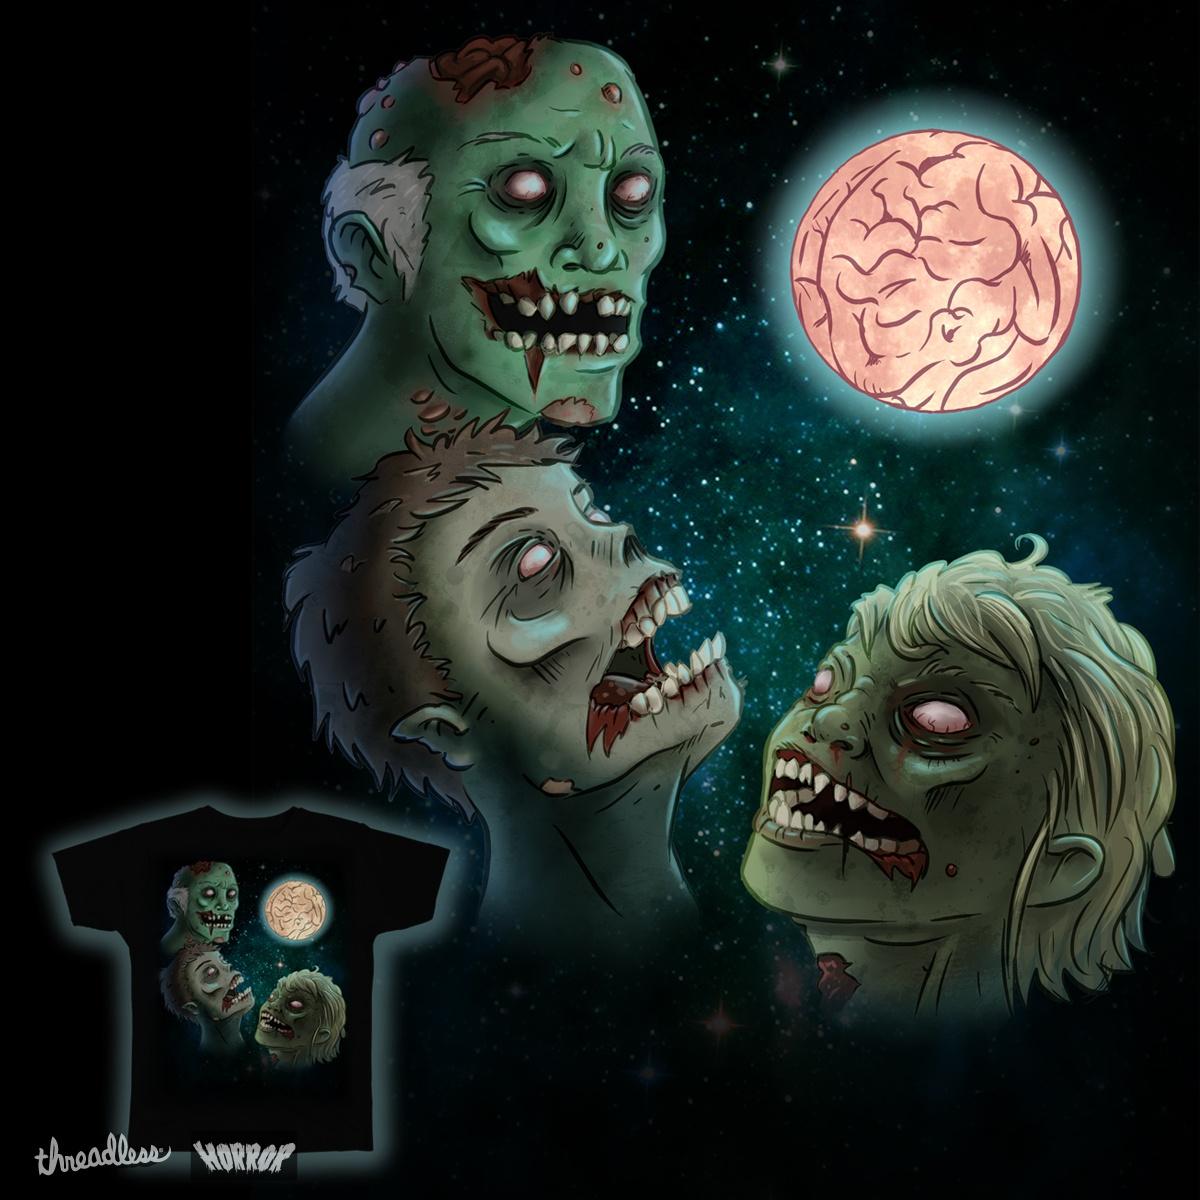 Three Zombie Moon by timothy Jones on Threadless